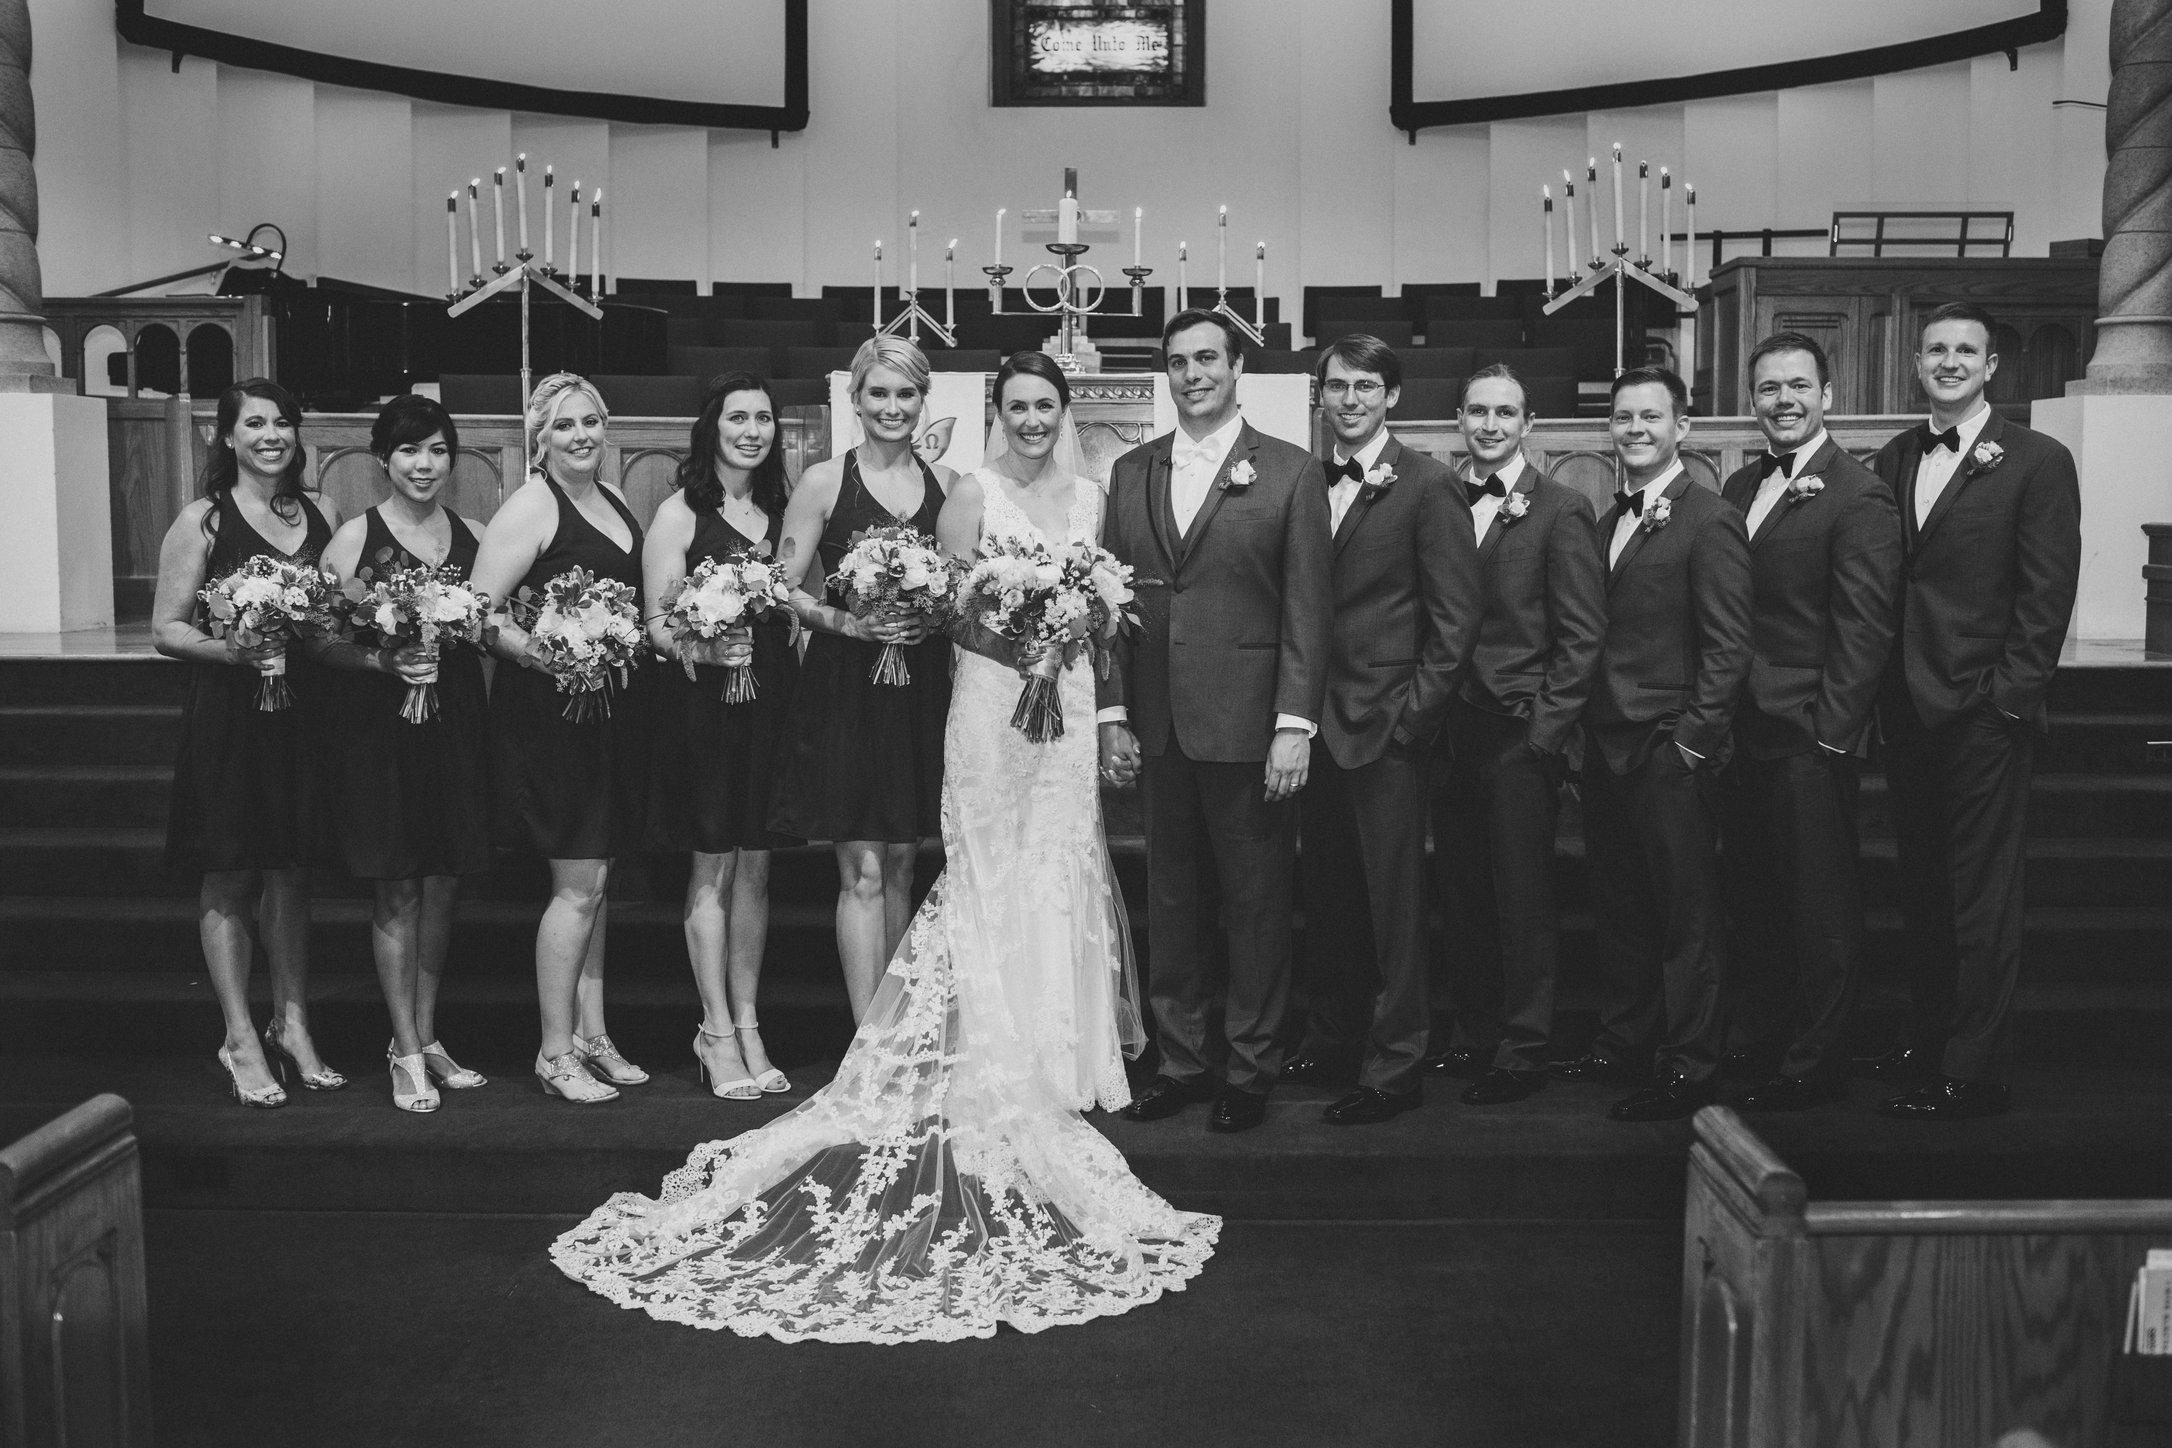 SandC-wedding-253.jpg